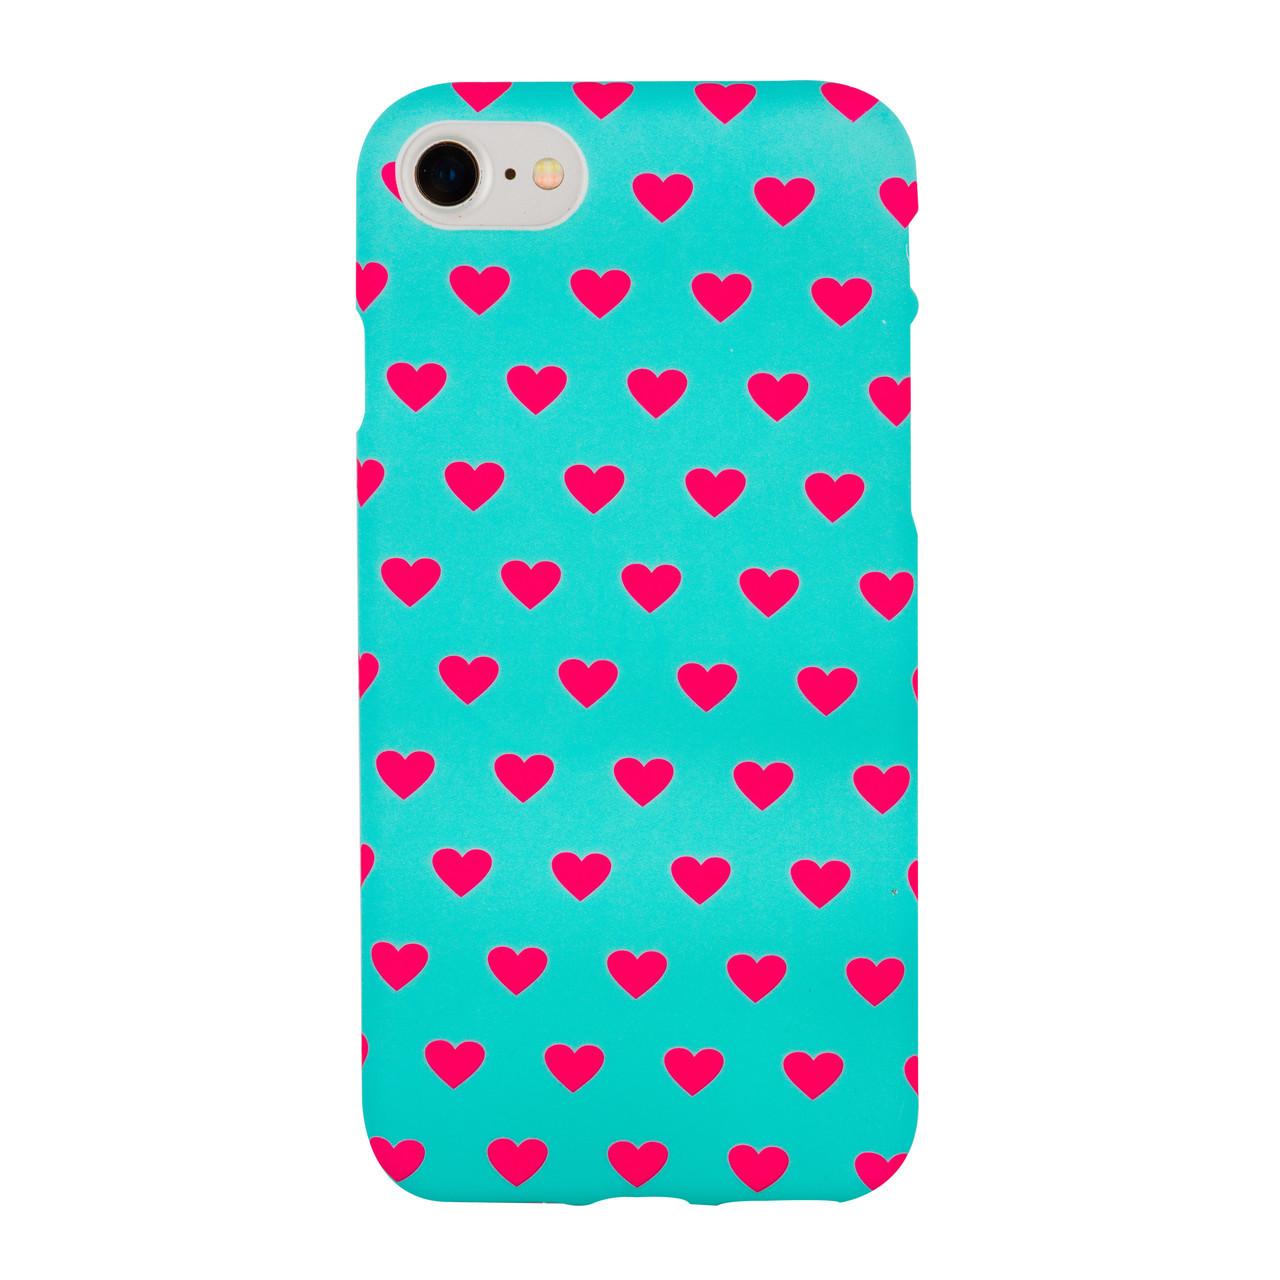 Чехол Ella для iPhone 6/6s Plus Mint Hearts (25845)